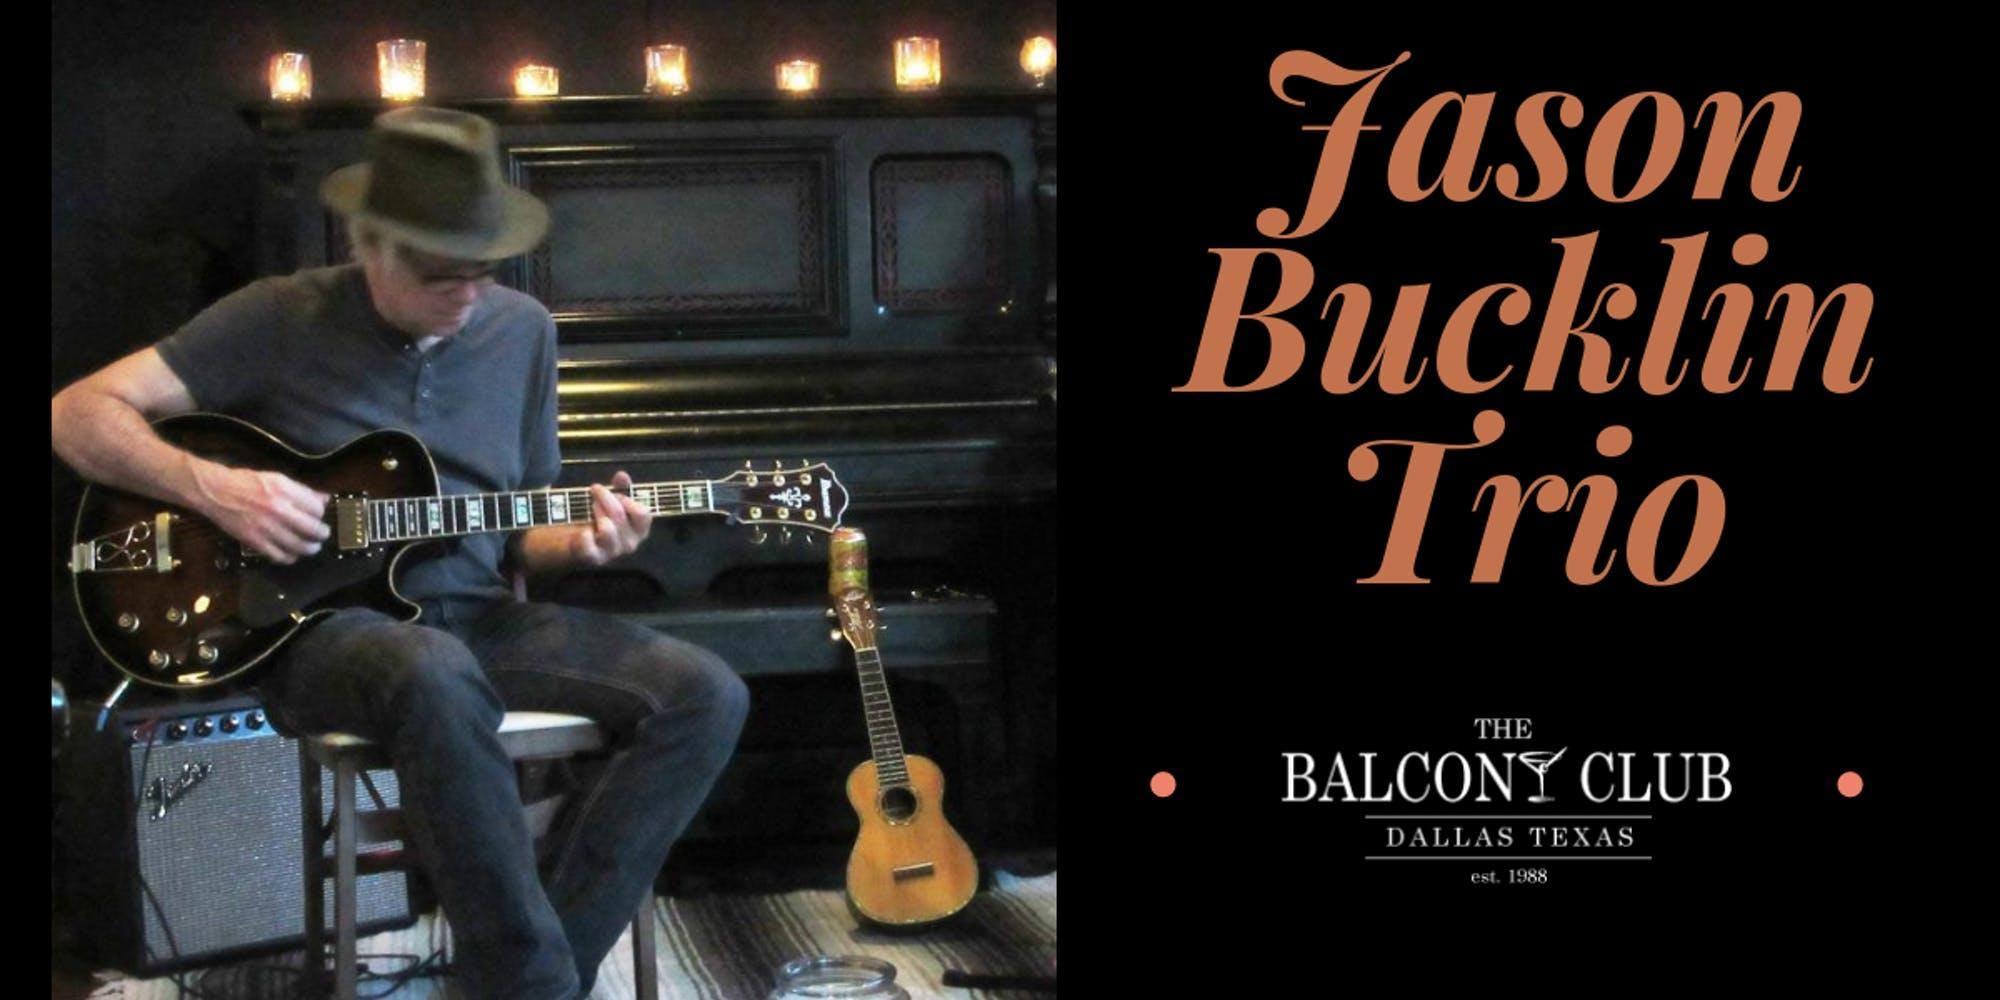 The Jason Bucklin Trio - Tuesday nights